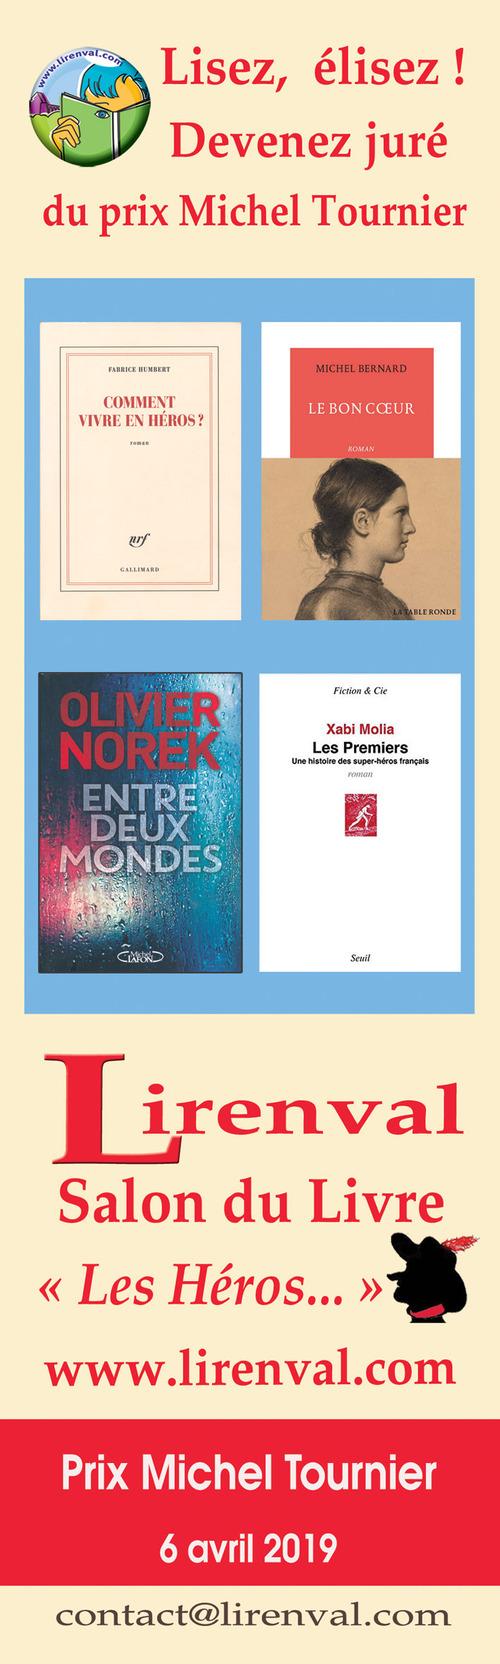 Salon du Livre LIRENVAL samedi 6 avril 2019